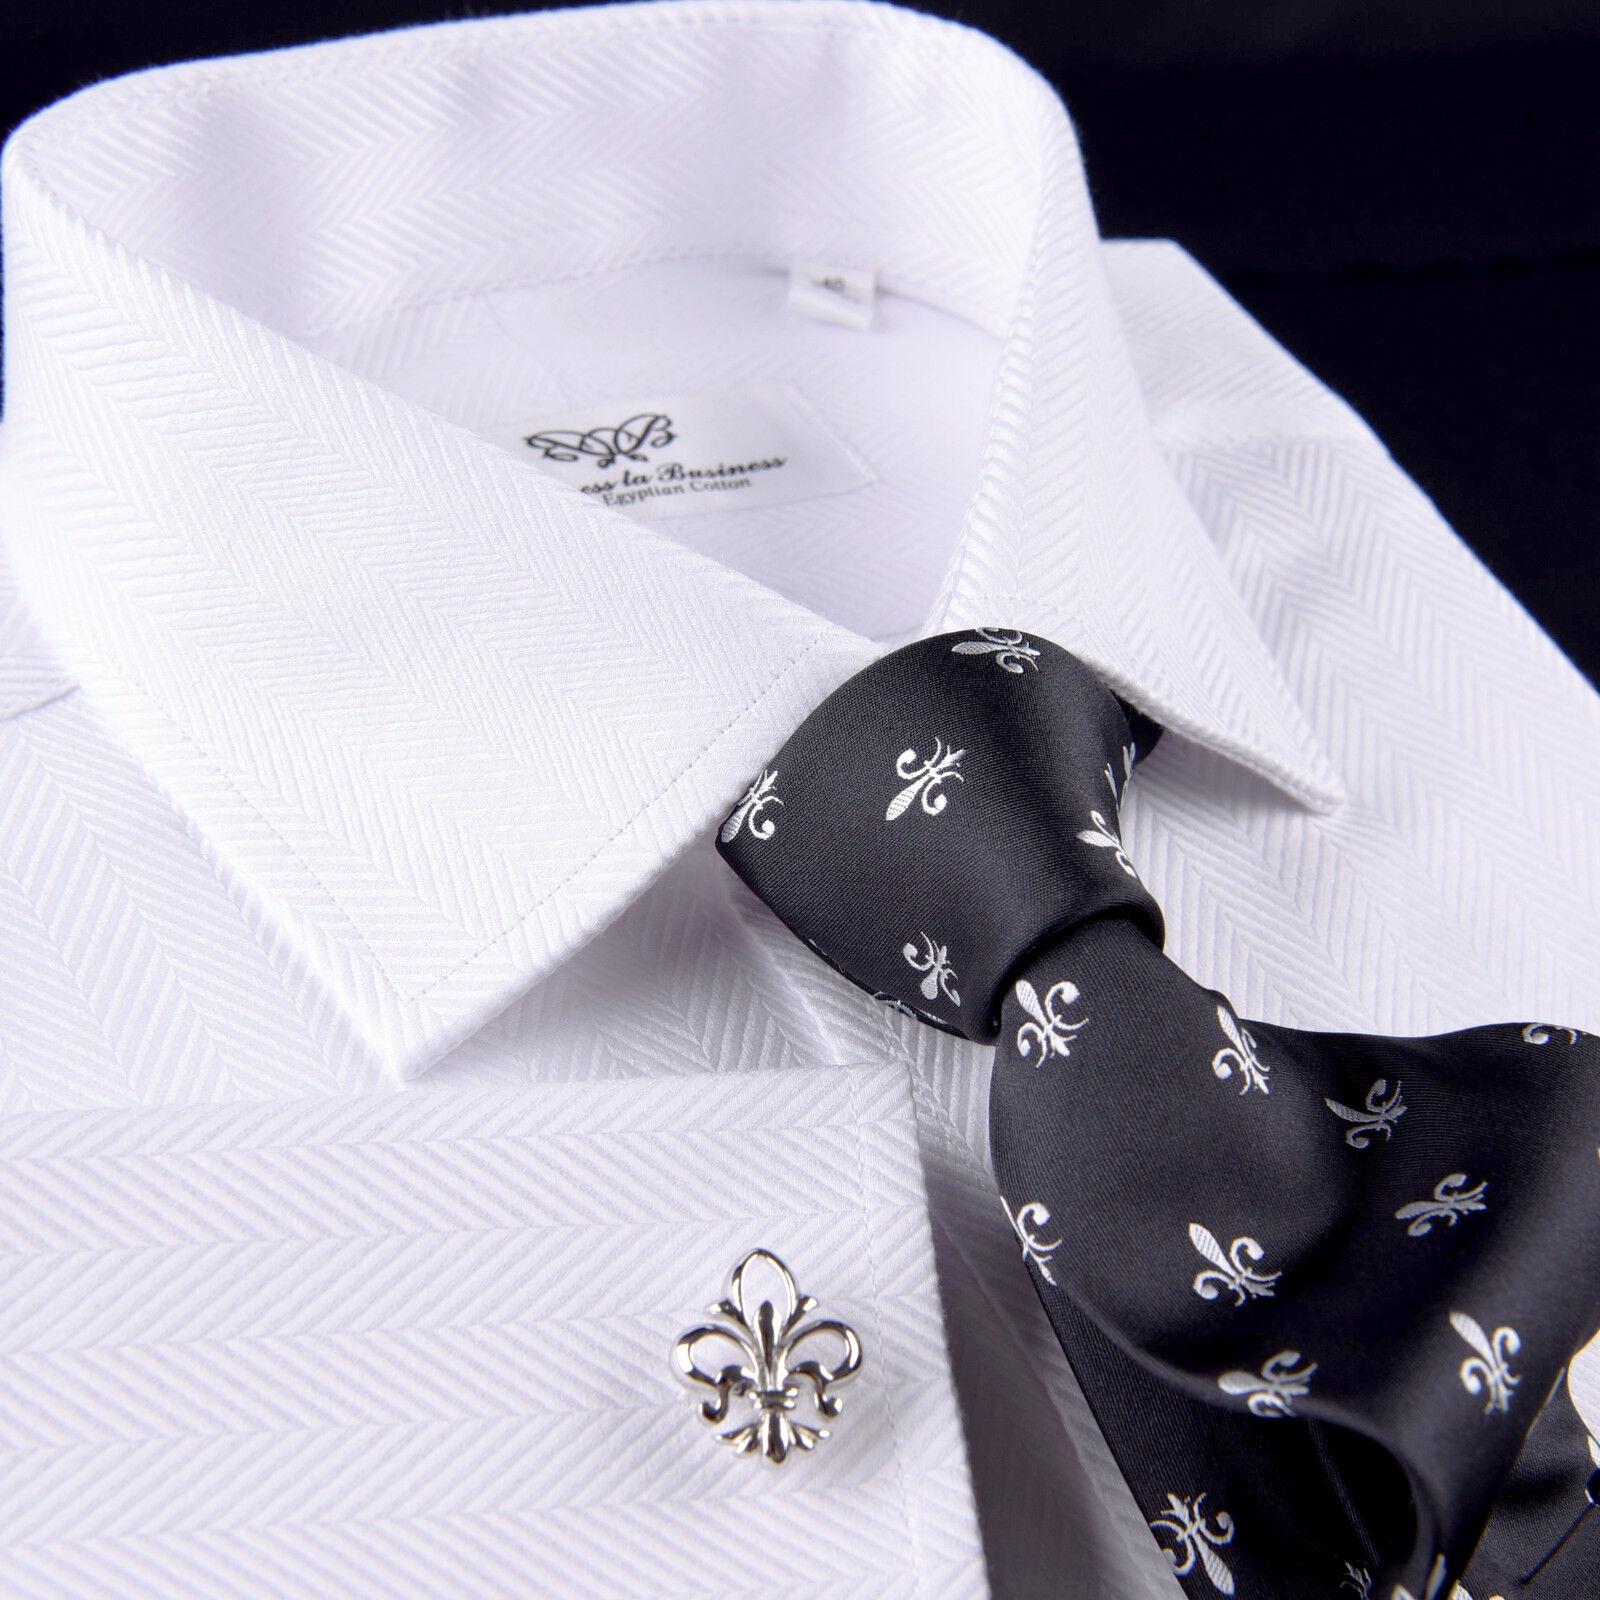 Wide White Herringbone Twill Luxury Dress Shirt Formal Egyptian Twill Business